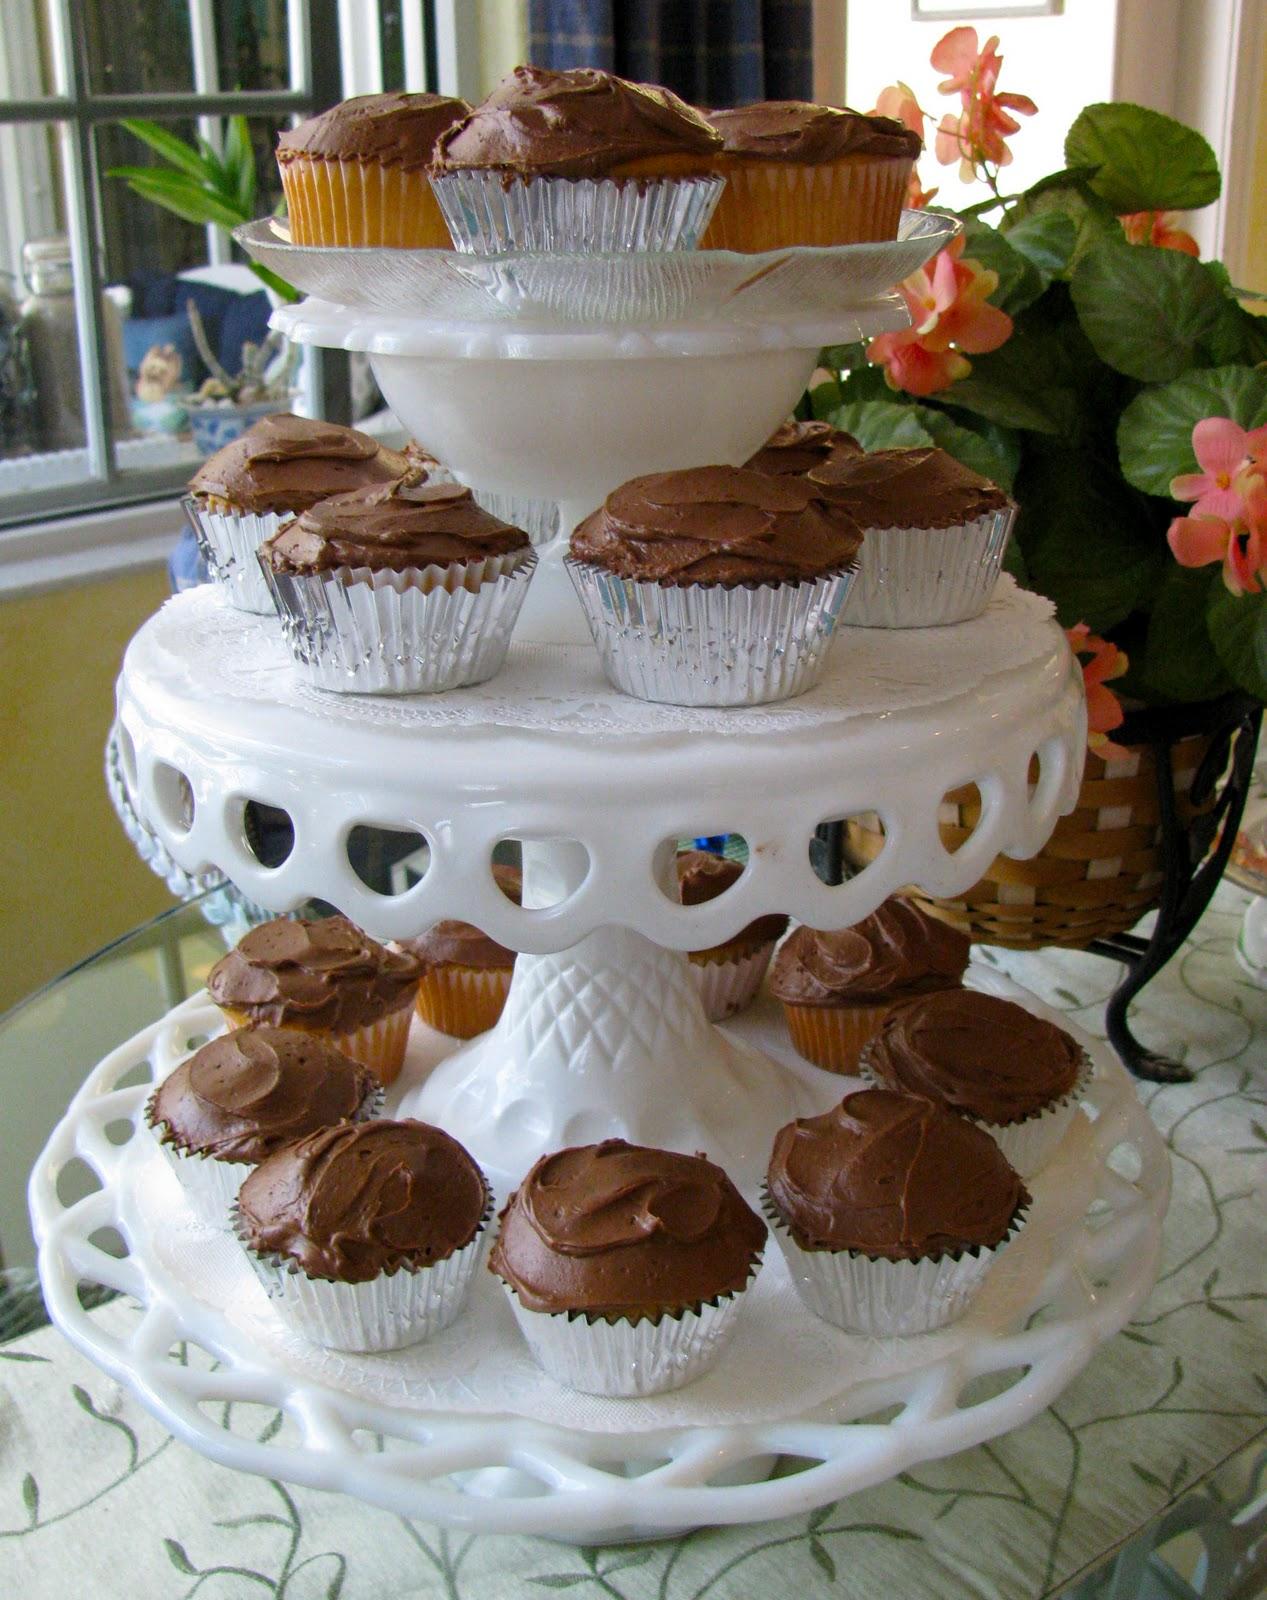 Rita S Recipes Good Ol Cupcakes